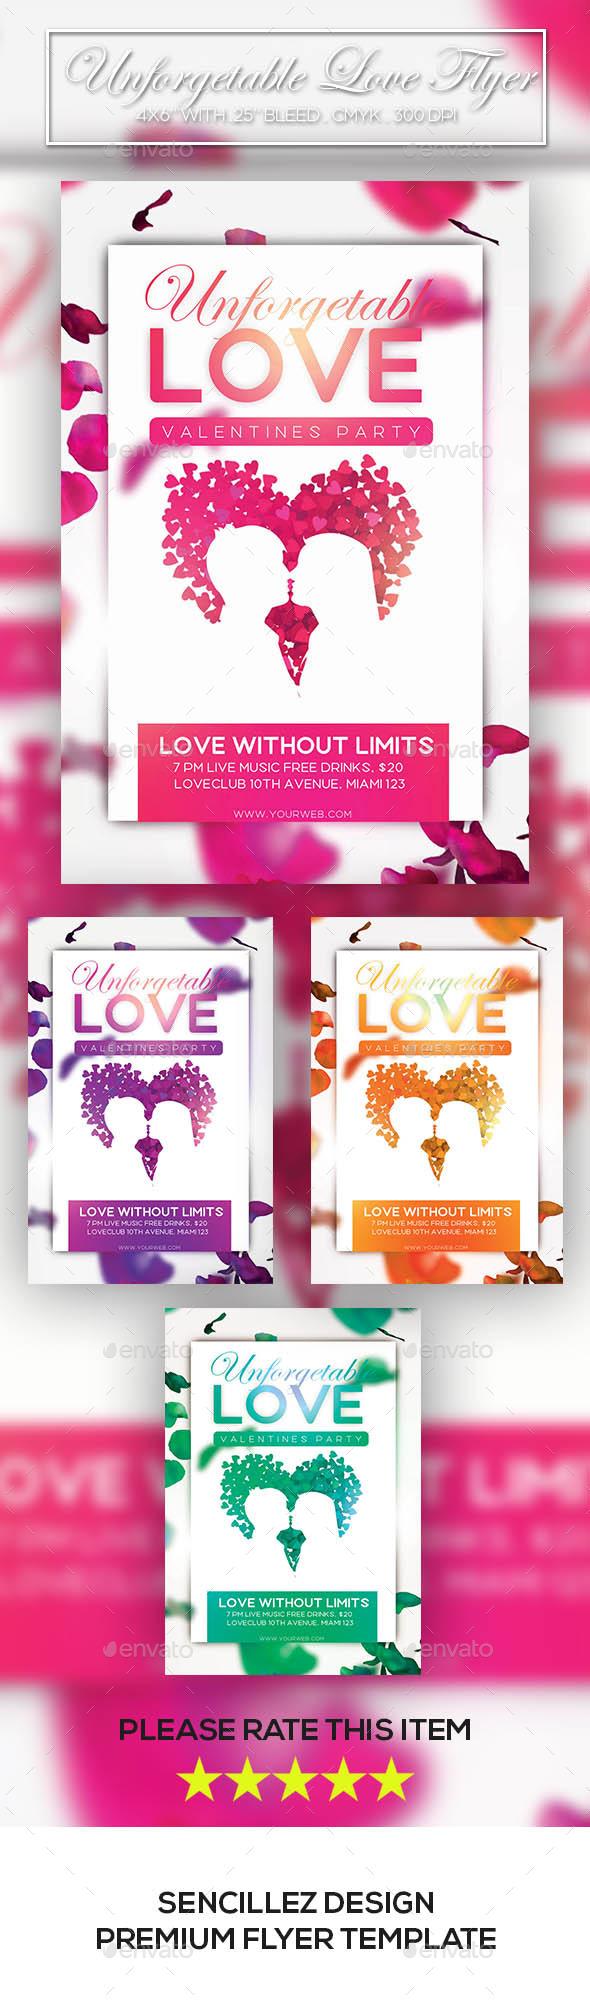 GraphicRiver Unforgettable Love Flyer 10230055